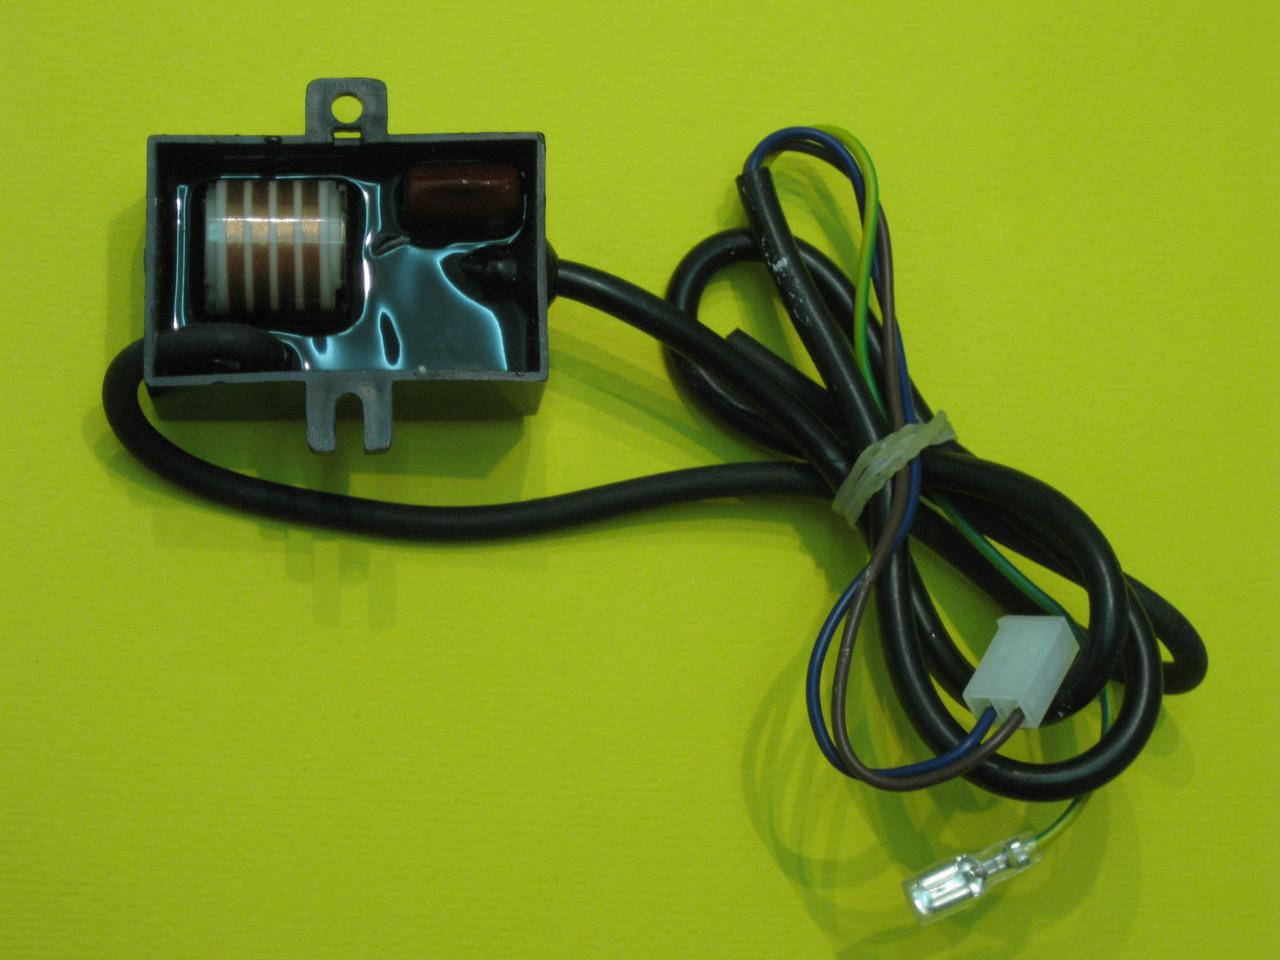 Блок розжига (устройство зажигания) Weller Mars, фото 2